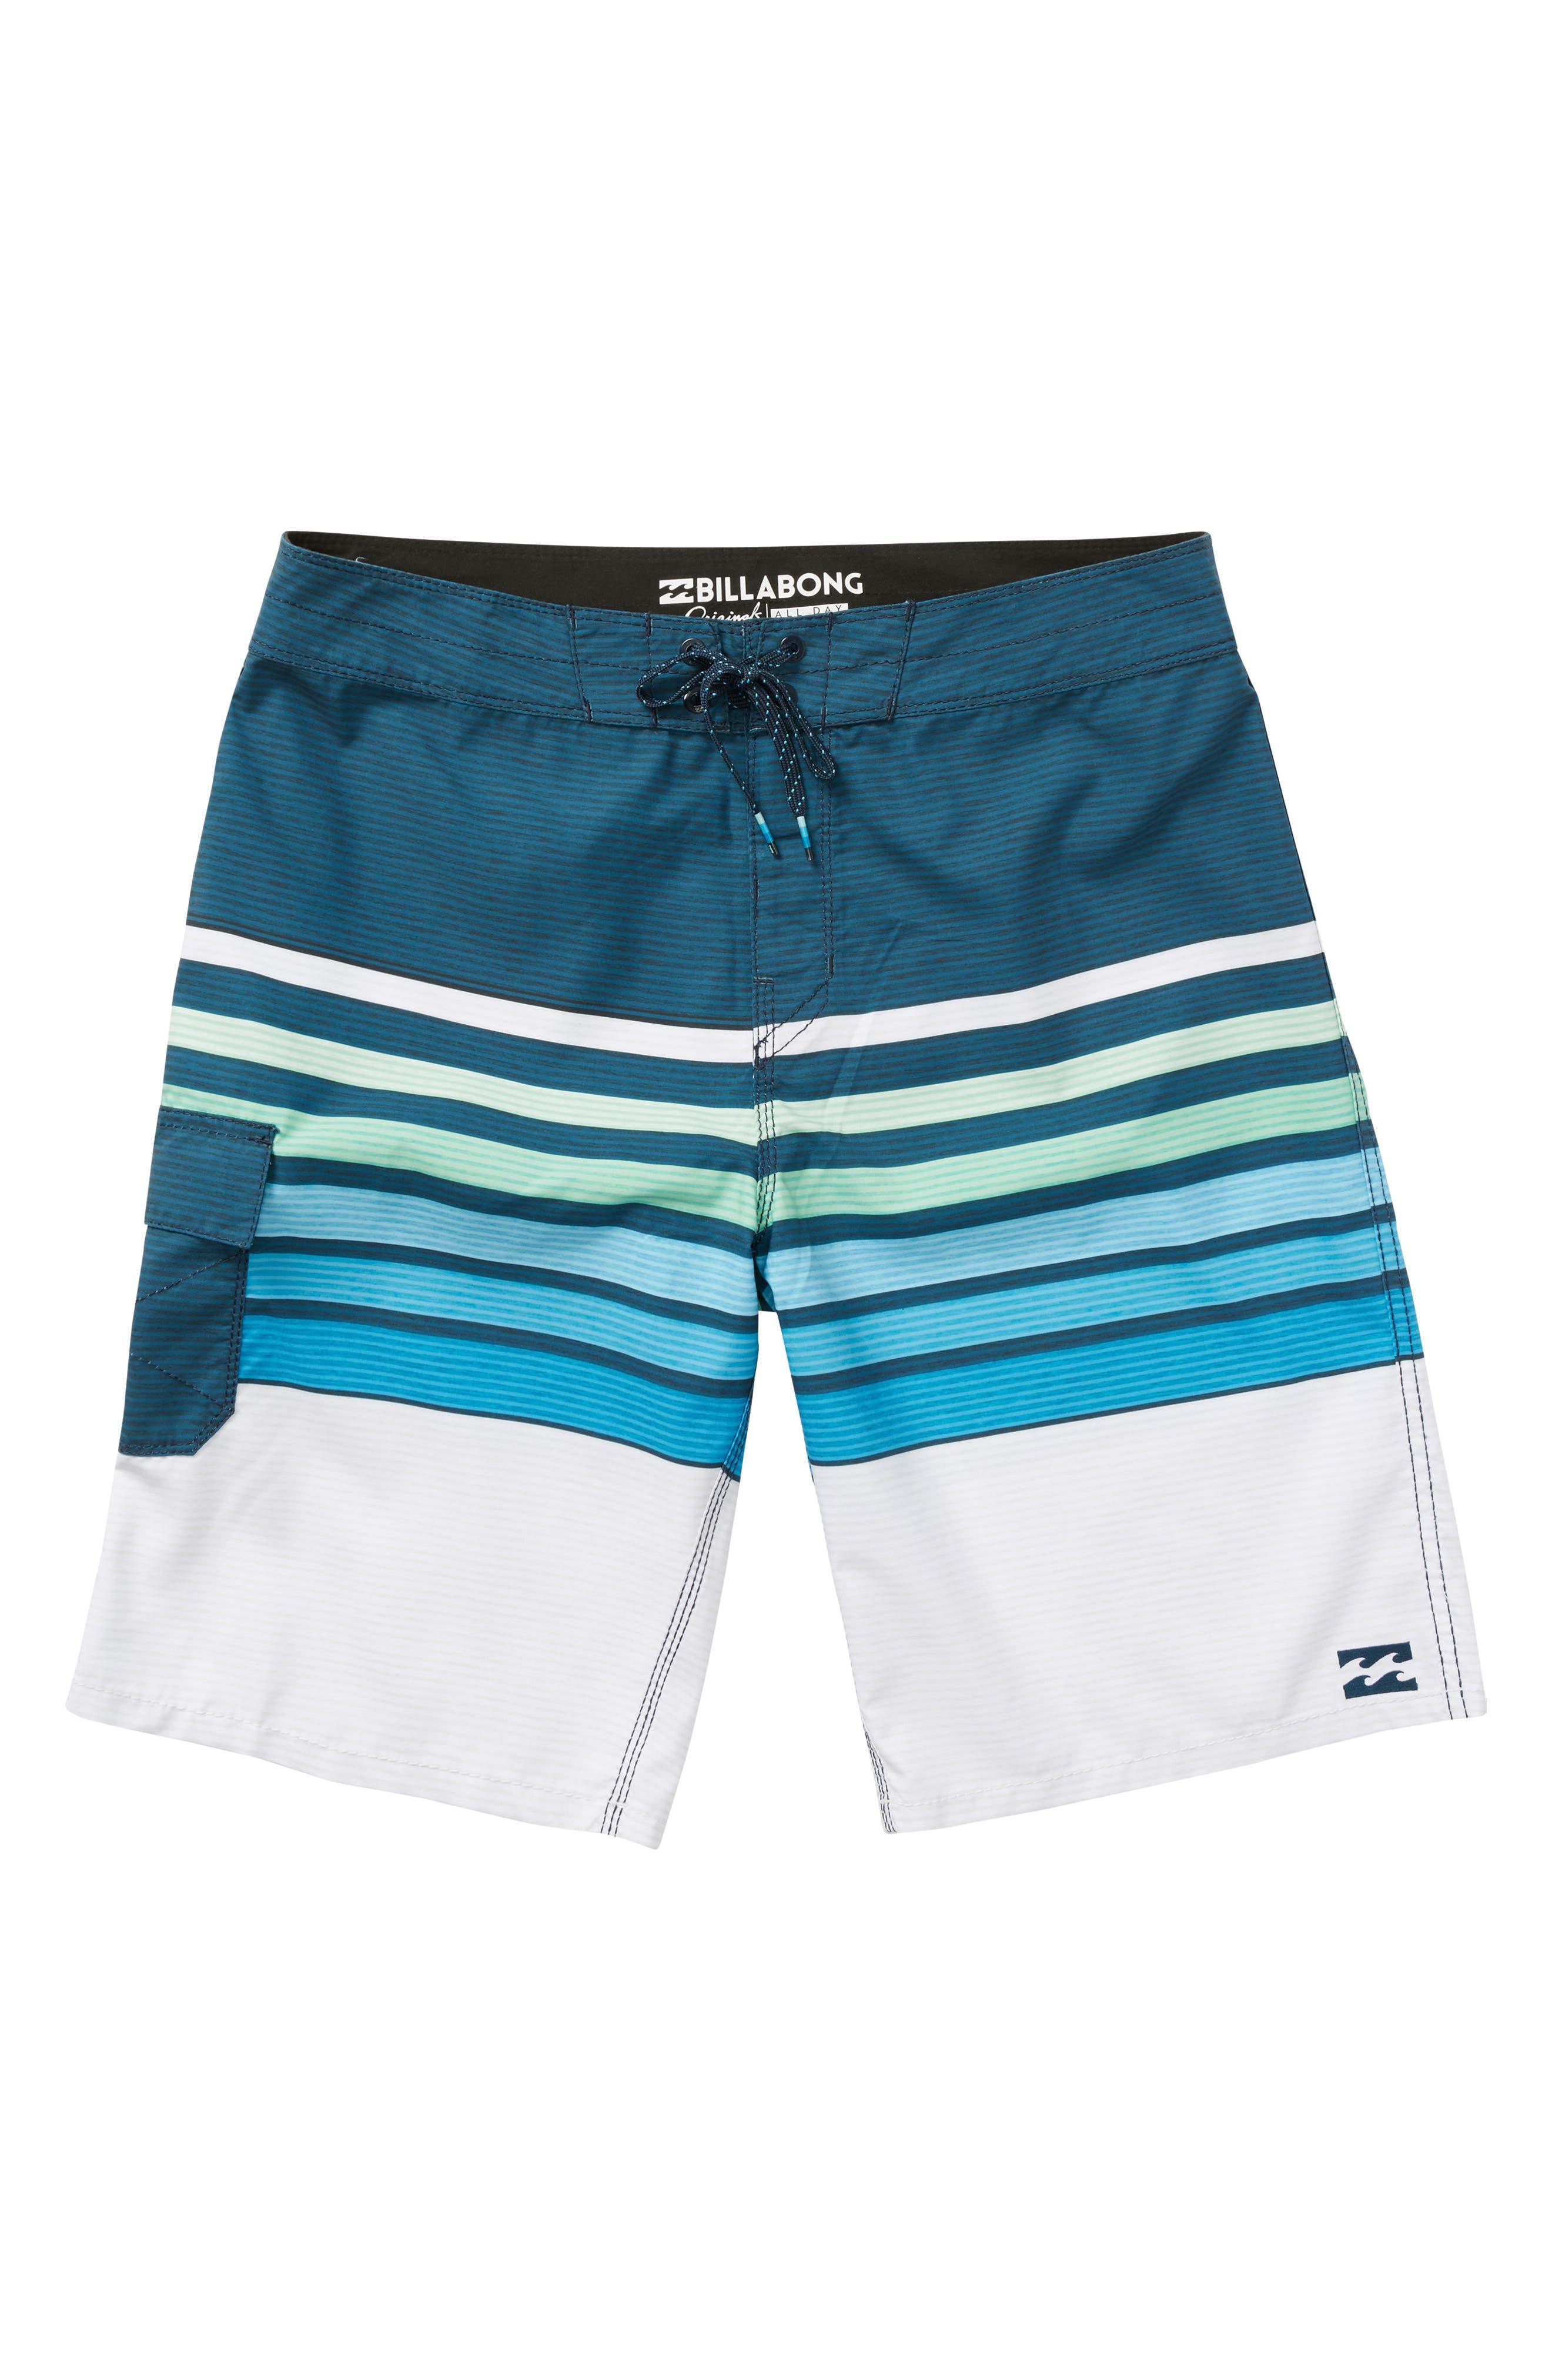 All Day OG Stripe Board Shorts,                             Alternate thumbnail 3, color,                             Blue